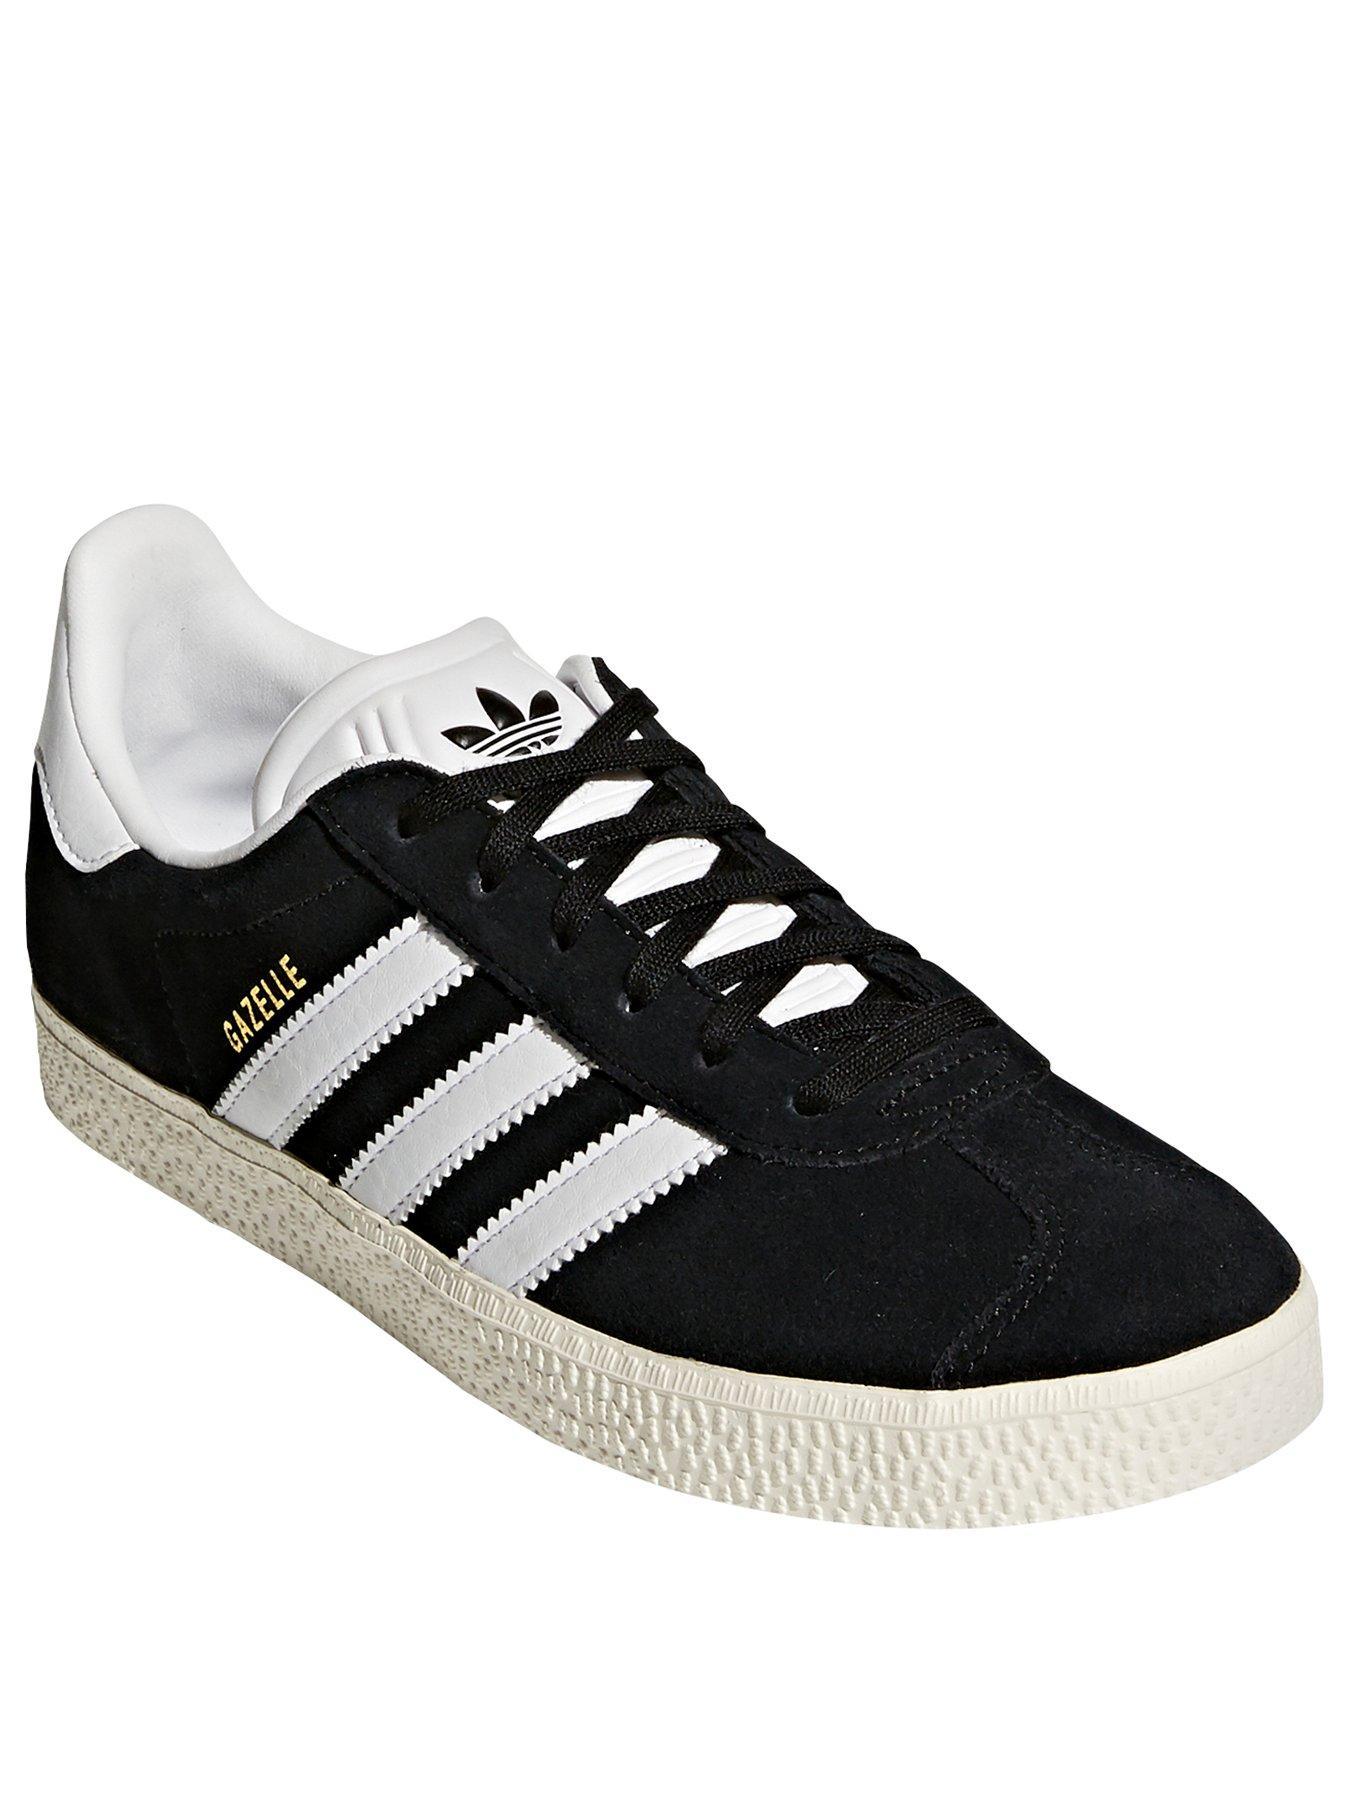 5.5 adidas trainers